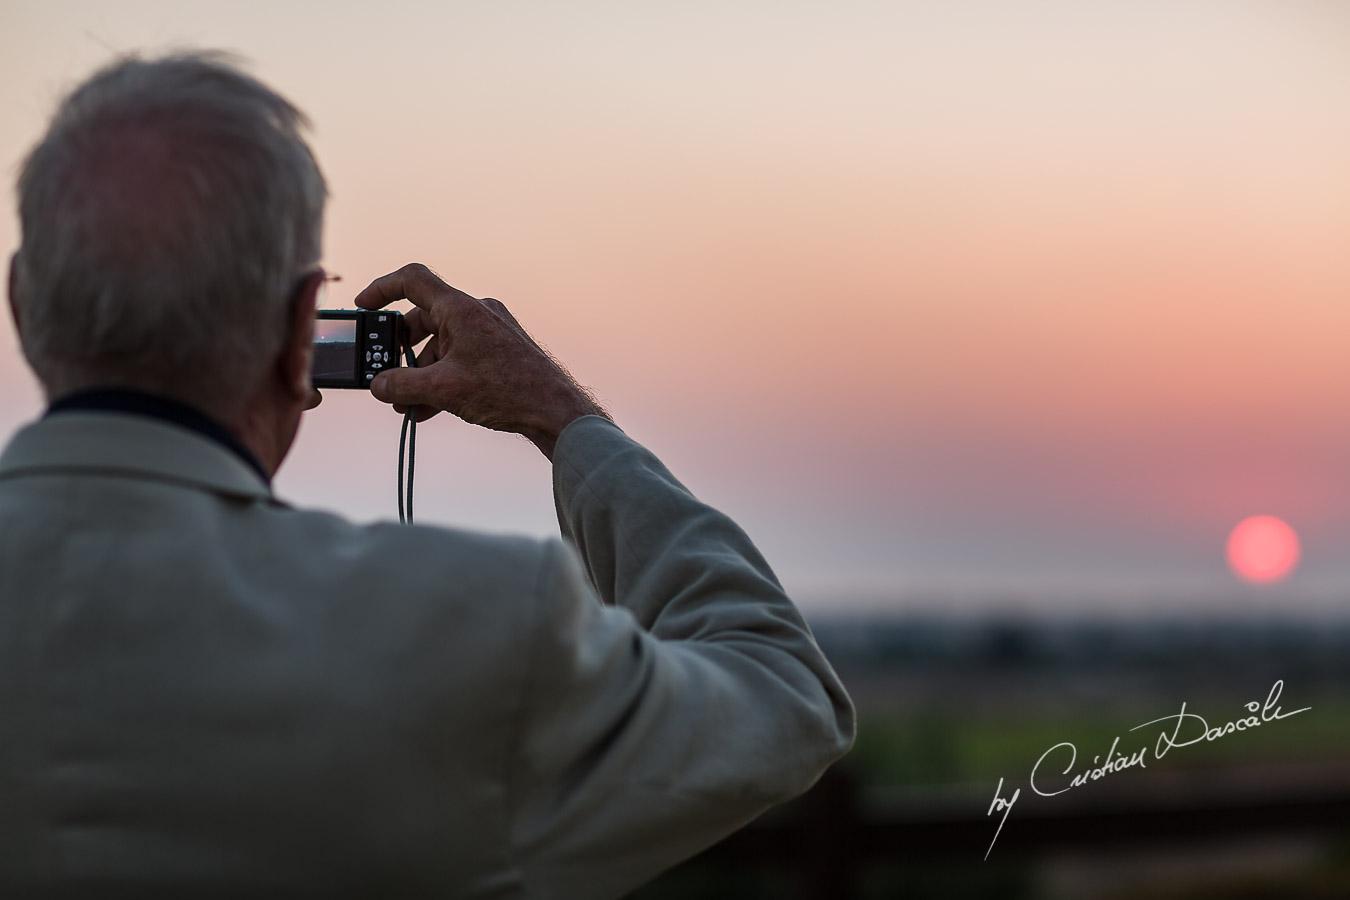 Gorgeous sunset captured form the Hills of the Elea Estate Golf by Cristian Dascalu wedding photographer.